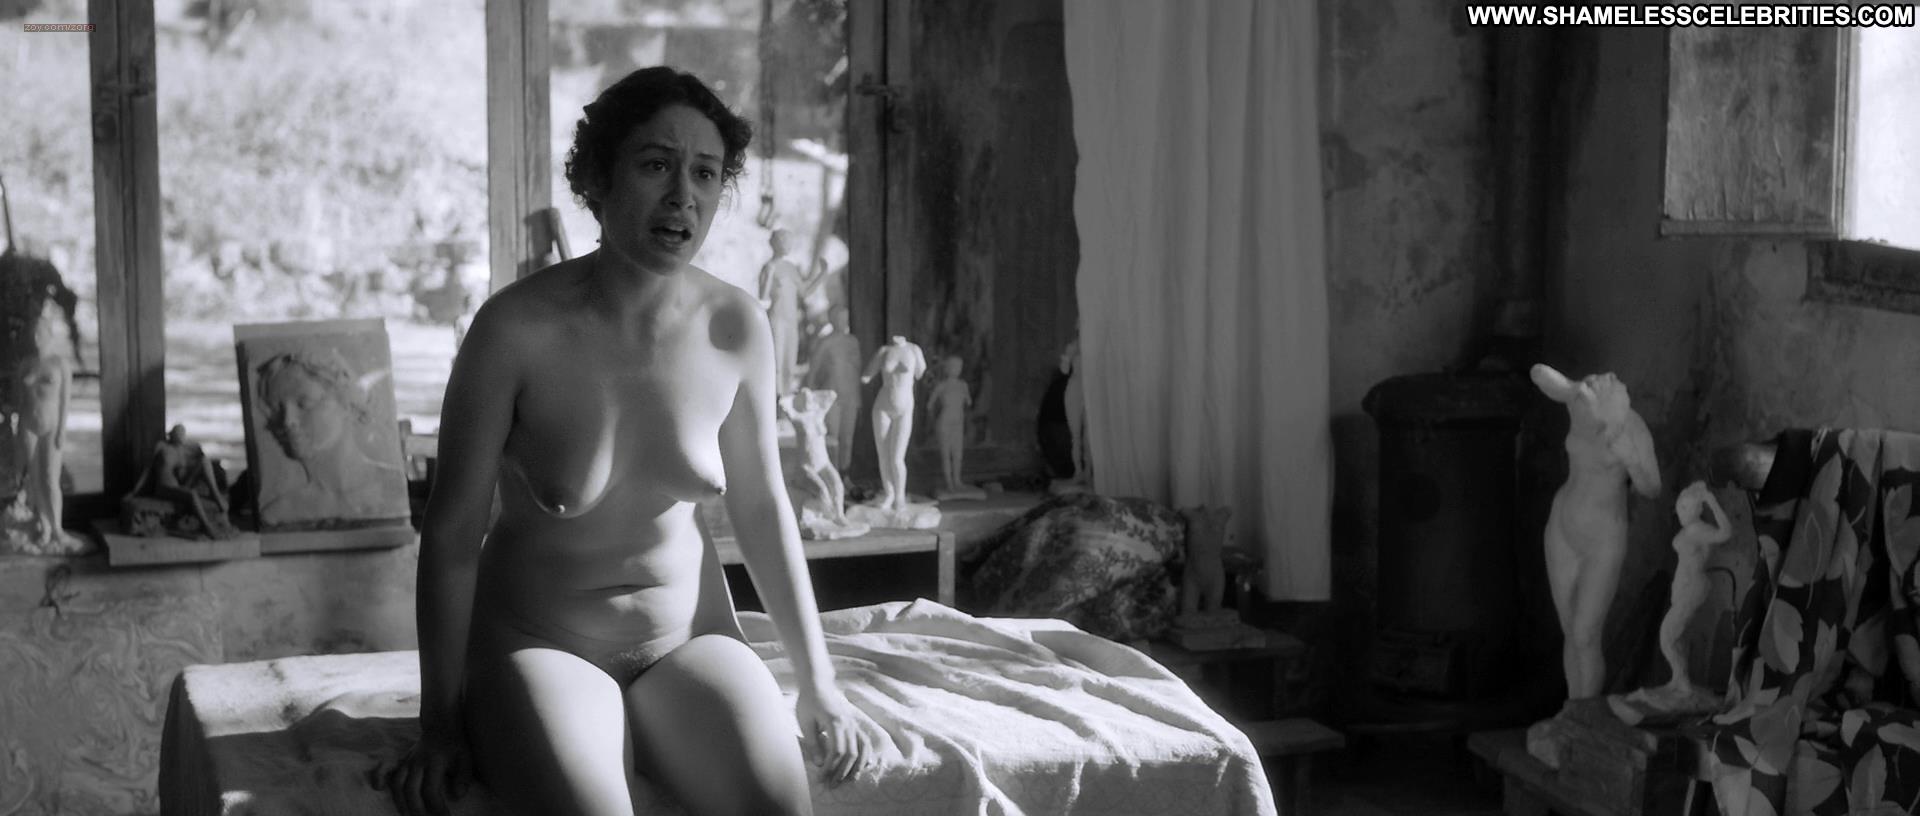 image Artist and the model lesbian scene